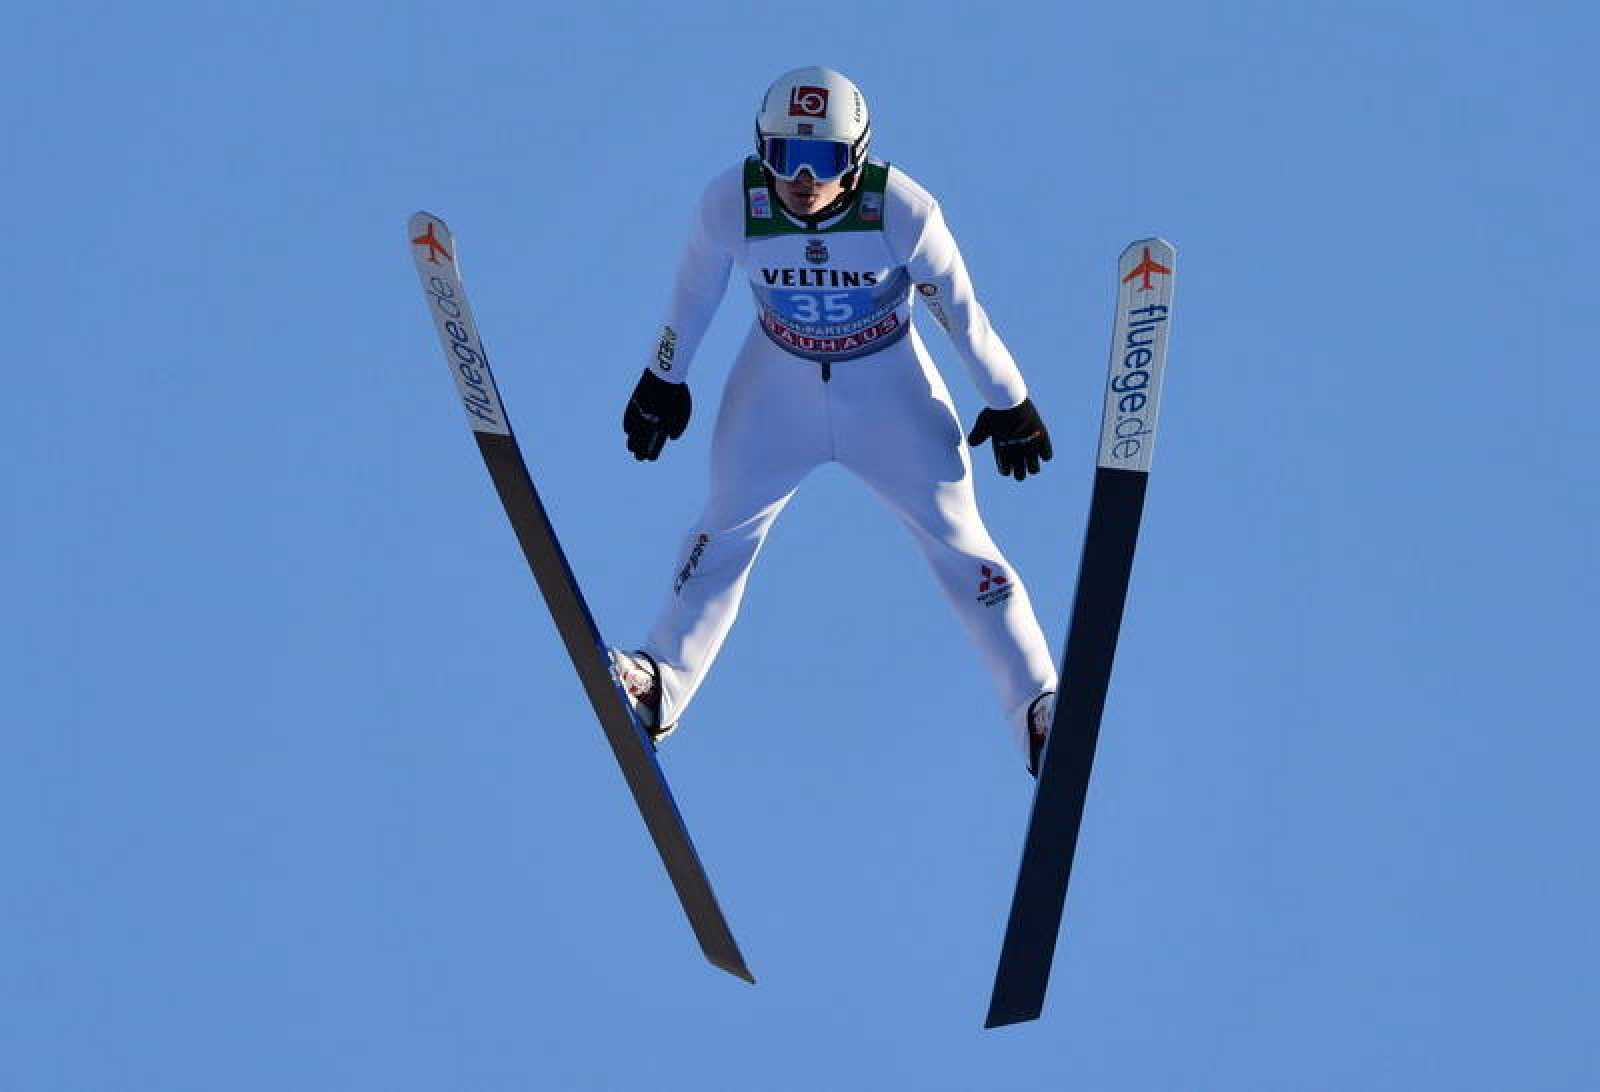 Salts d'esquí